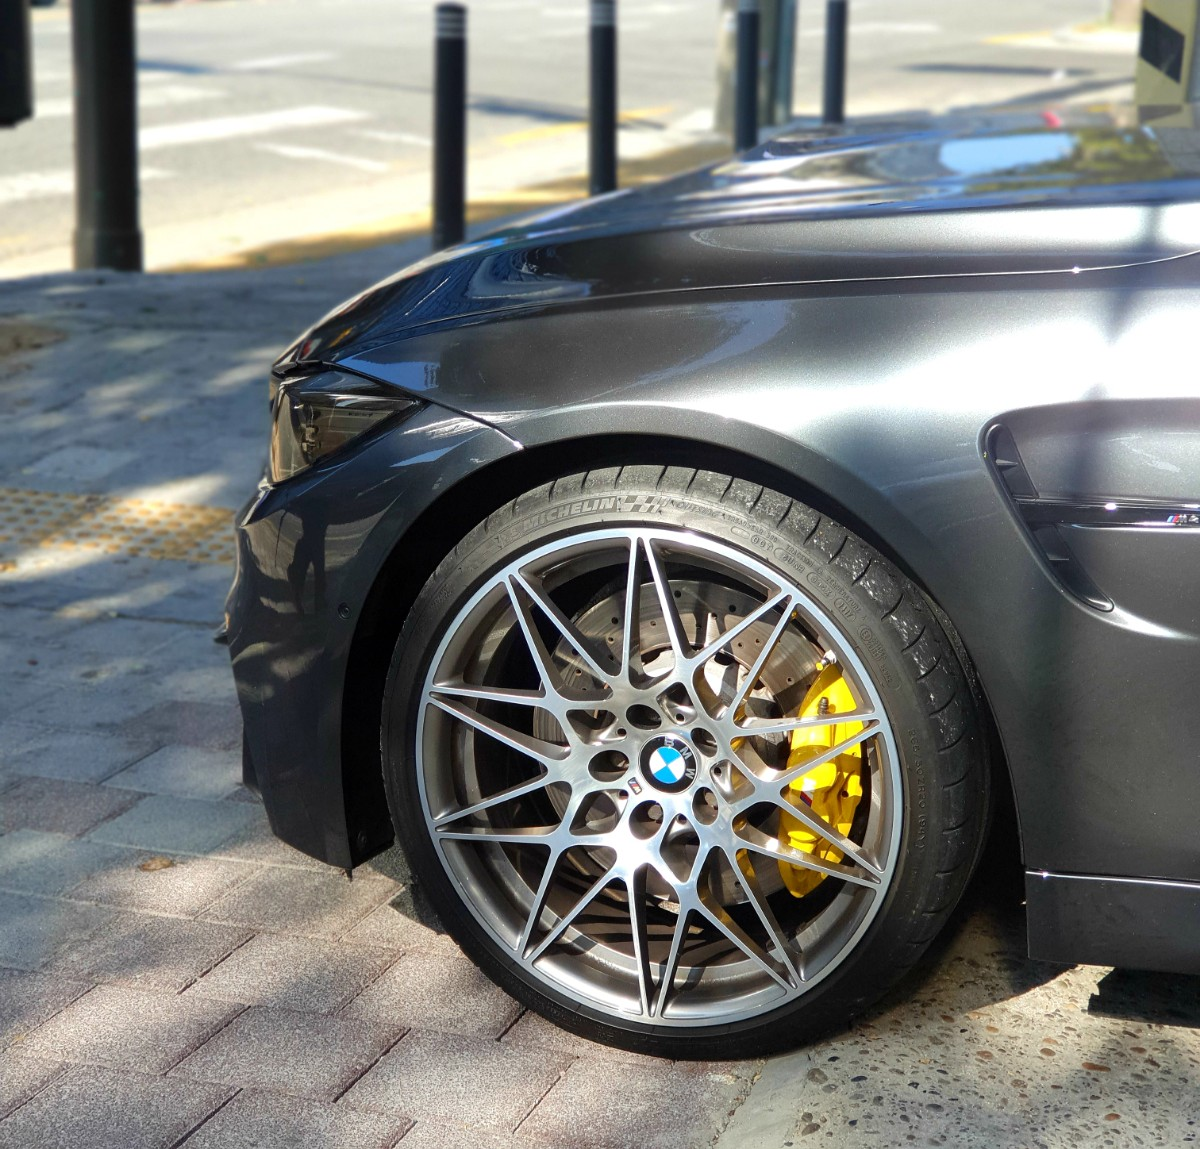 BMW m4 쿠페 (완전무사고) - 1